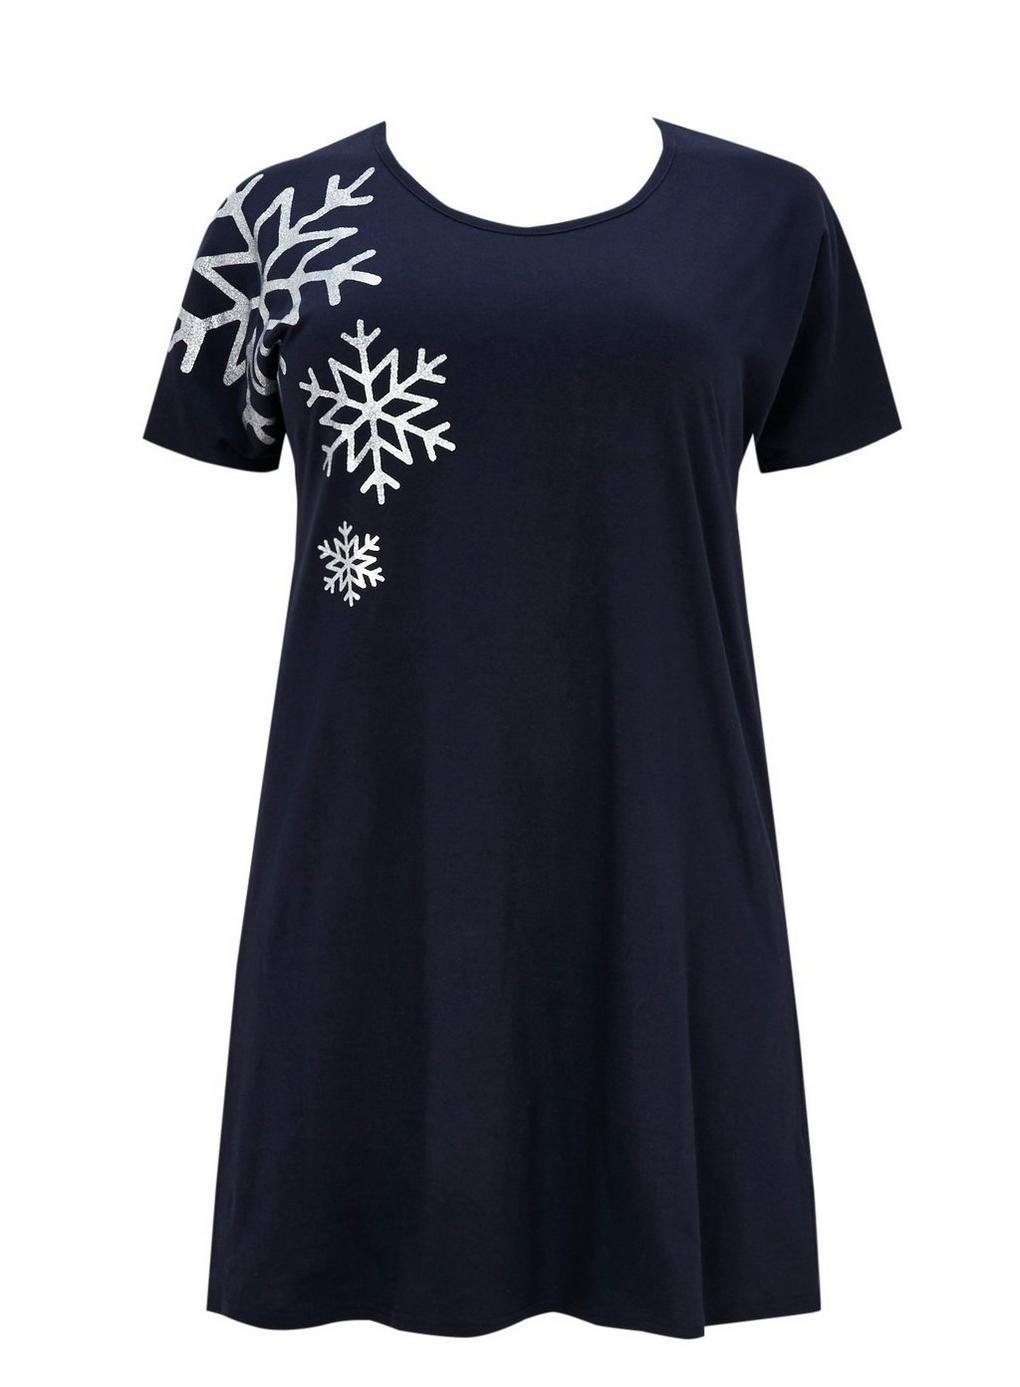 92caec512c Evans Navy Snowflake Short Nightdress in Blue - Lyst